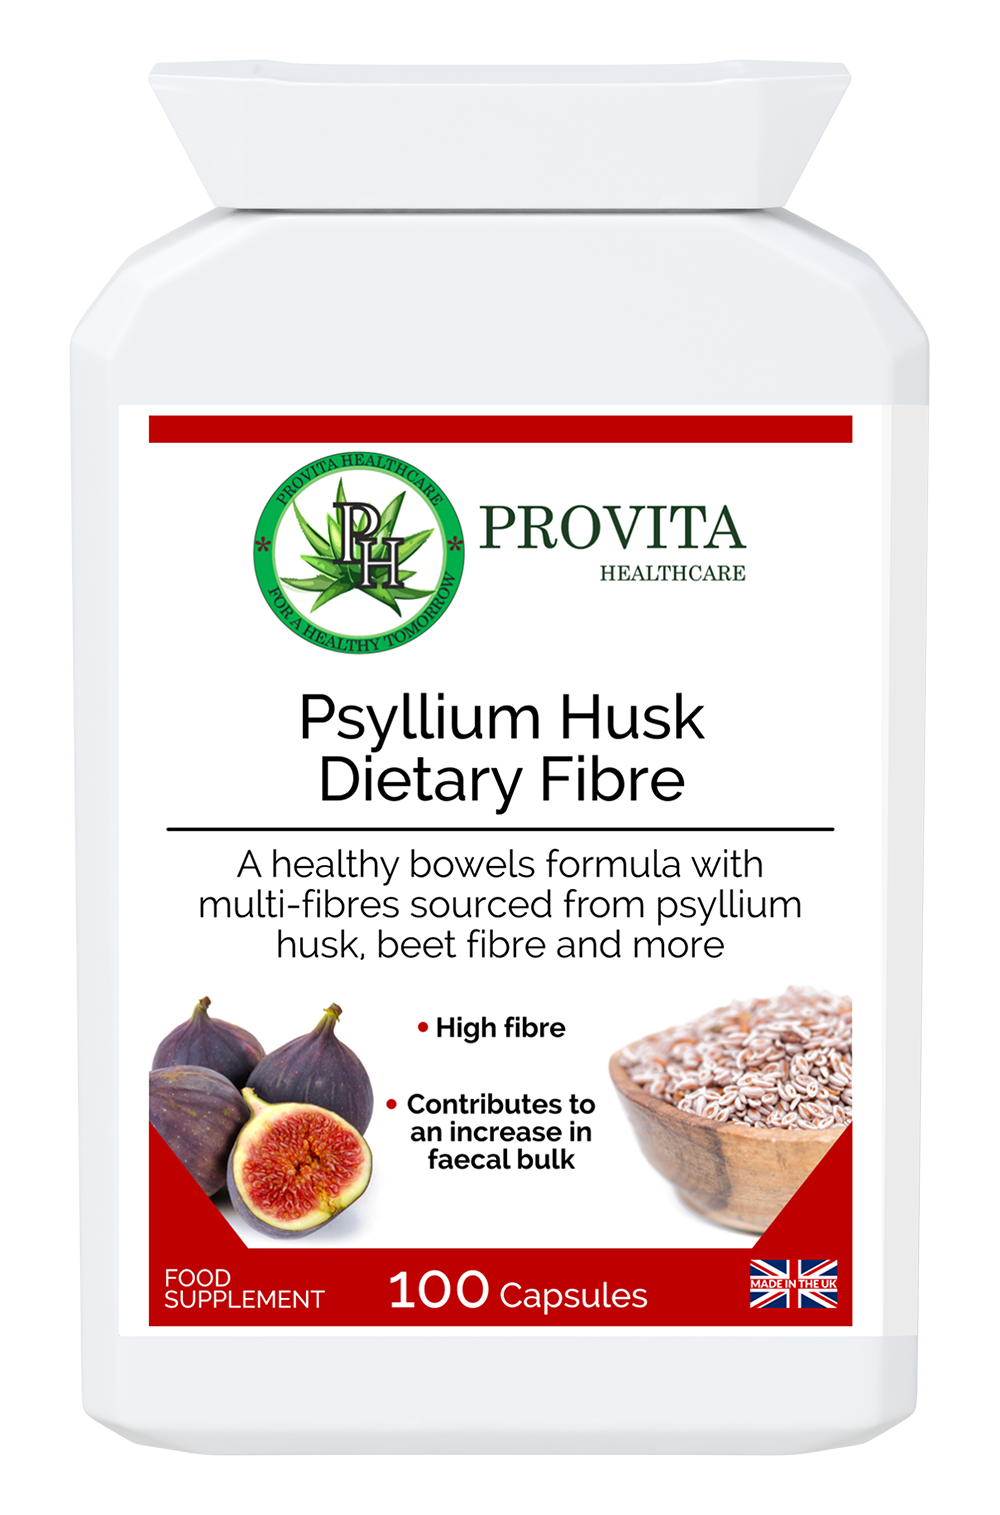 Psyllium Husk Dietary Fibre